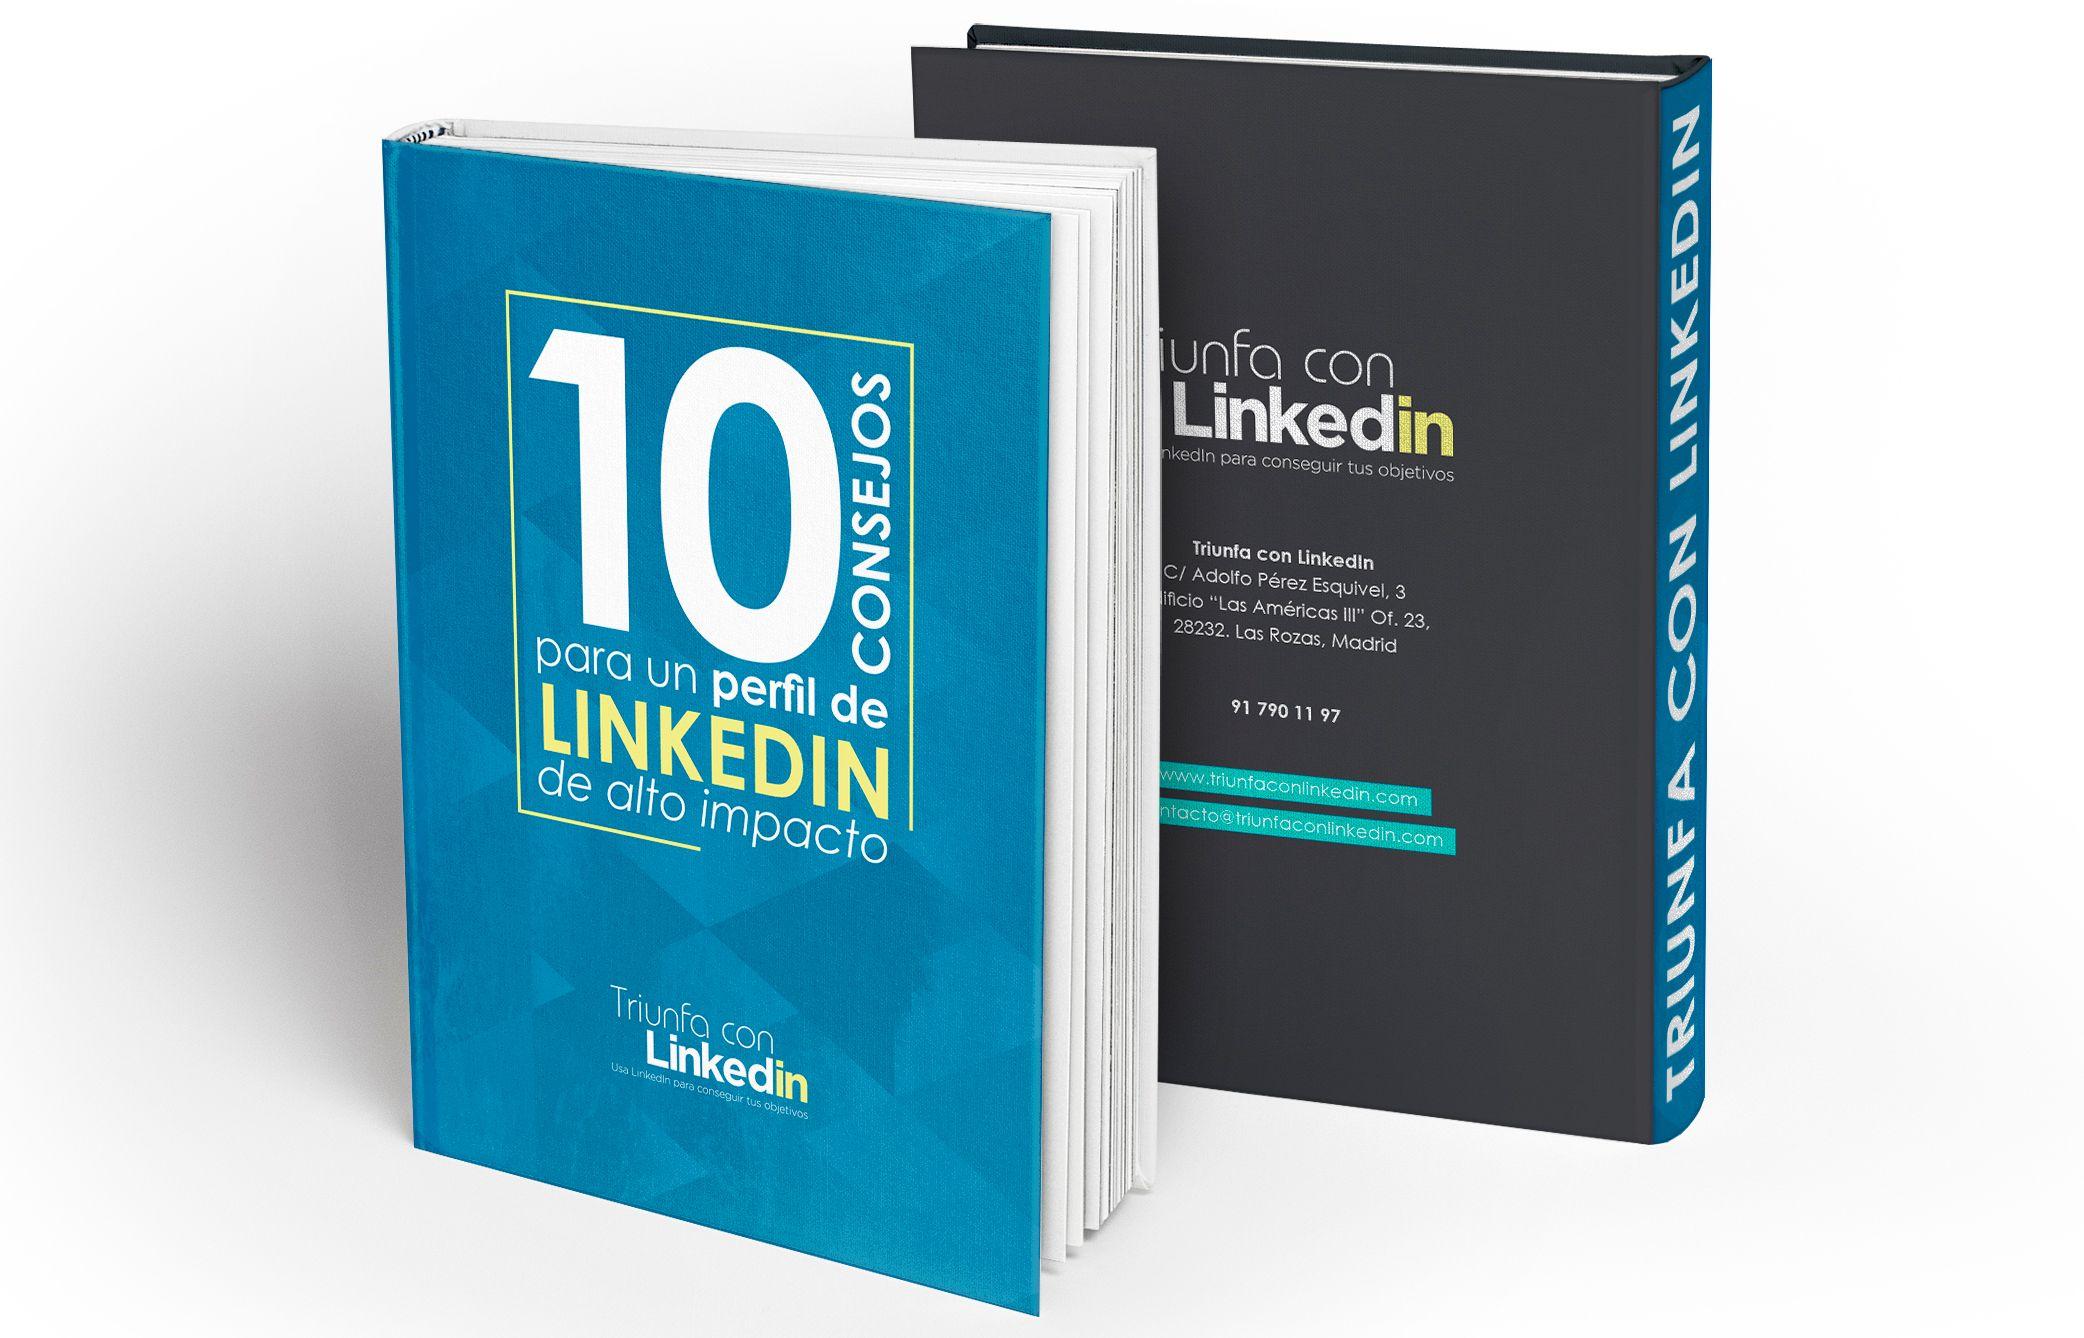 10 consejos para un perfil de LinkedIn de alto impacto